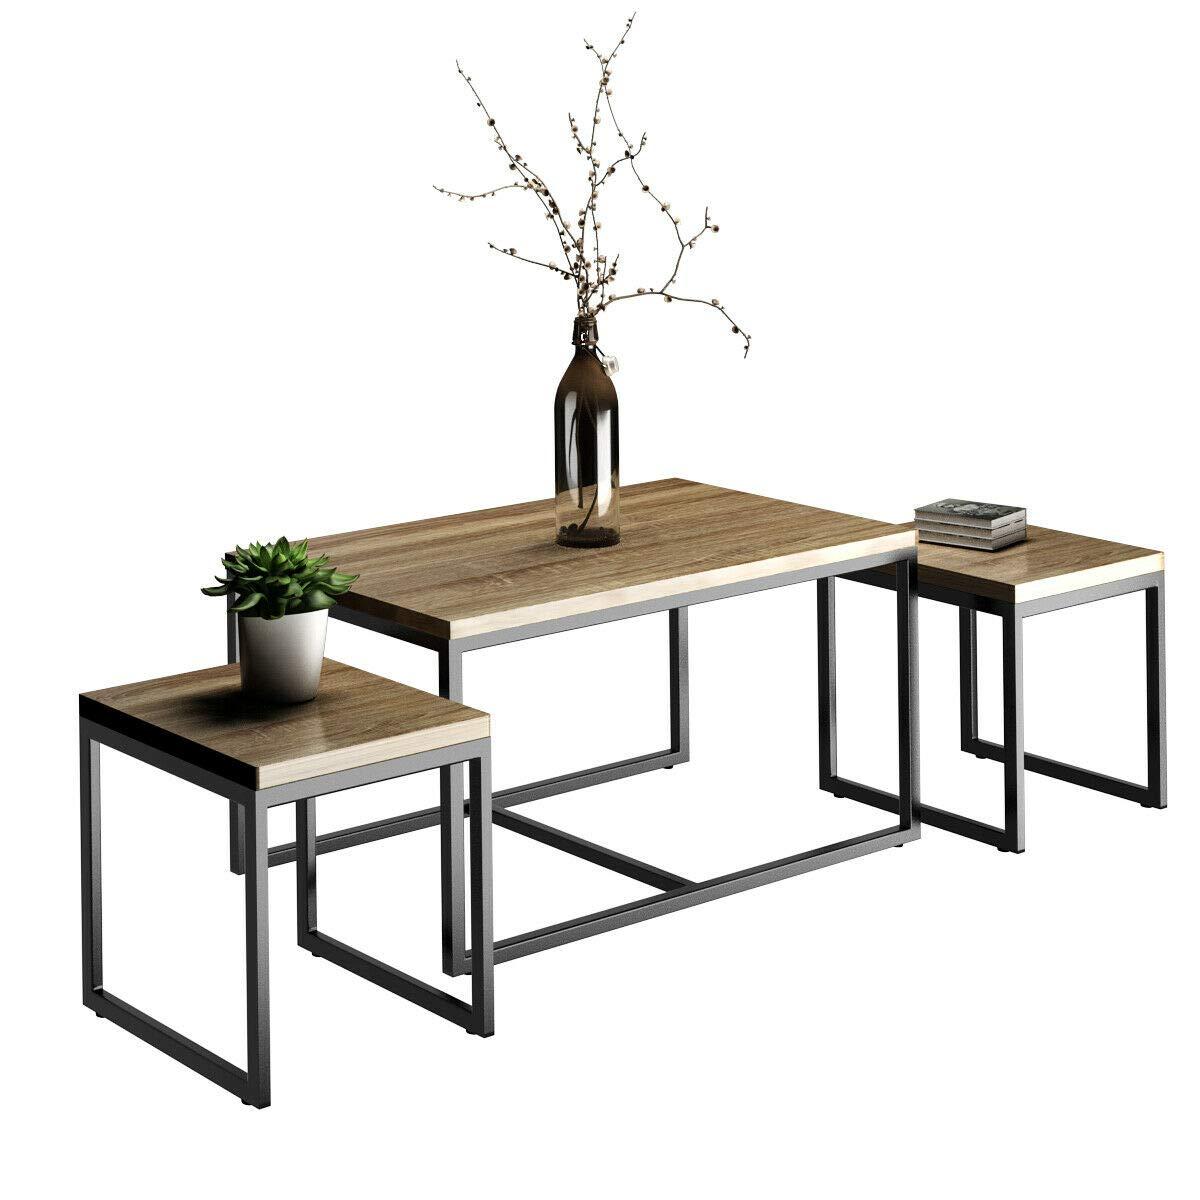 Giantex 3 Piece Nesting Coffee & End Table Set Wood Modern Living Room Furniture Decor